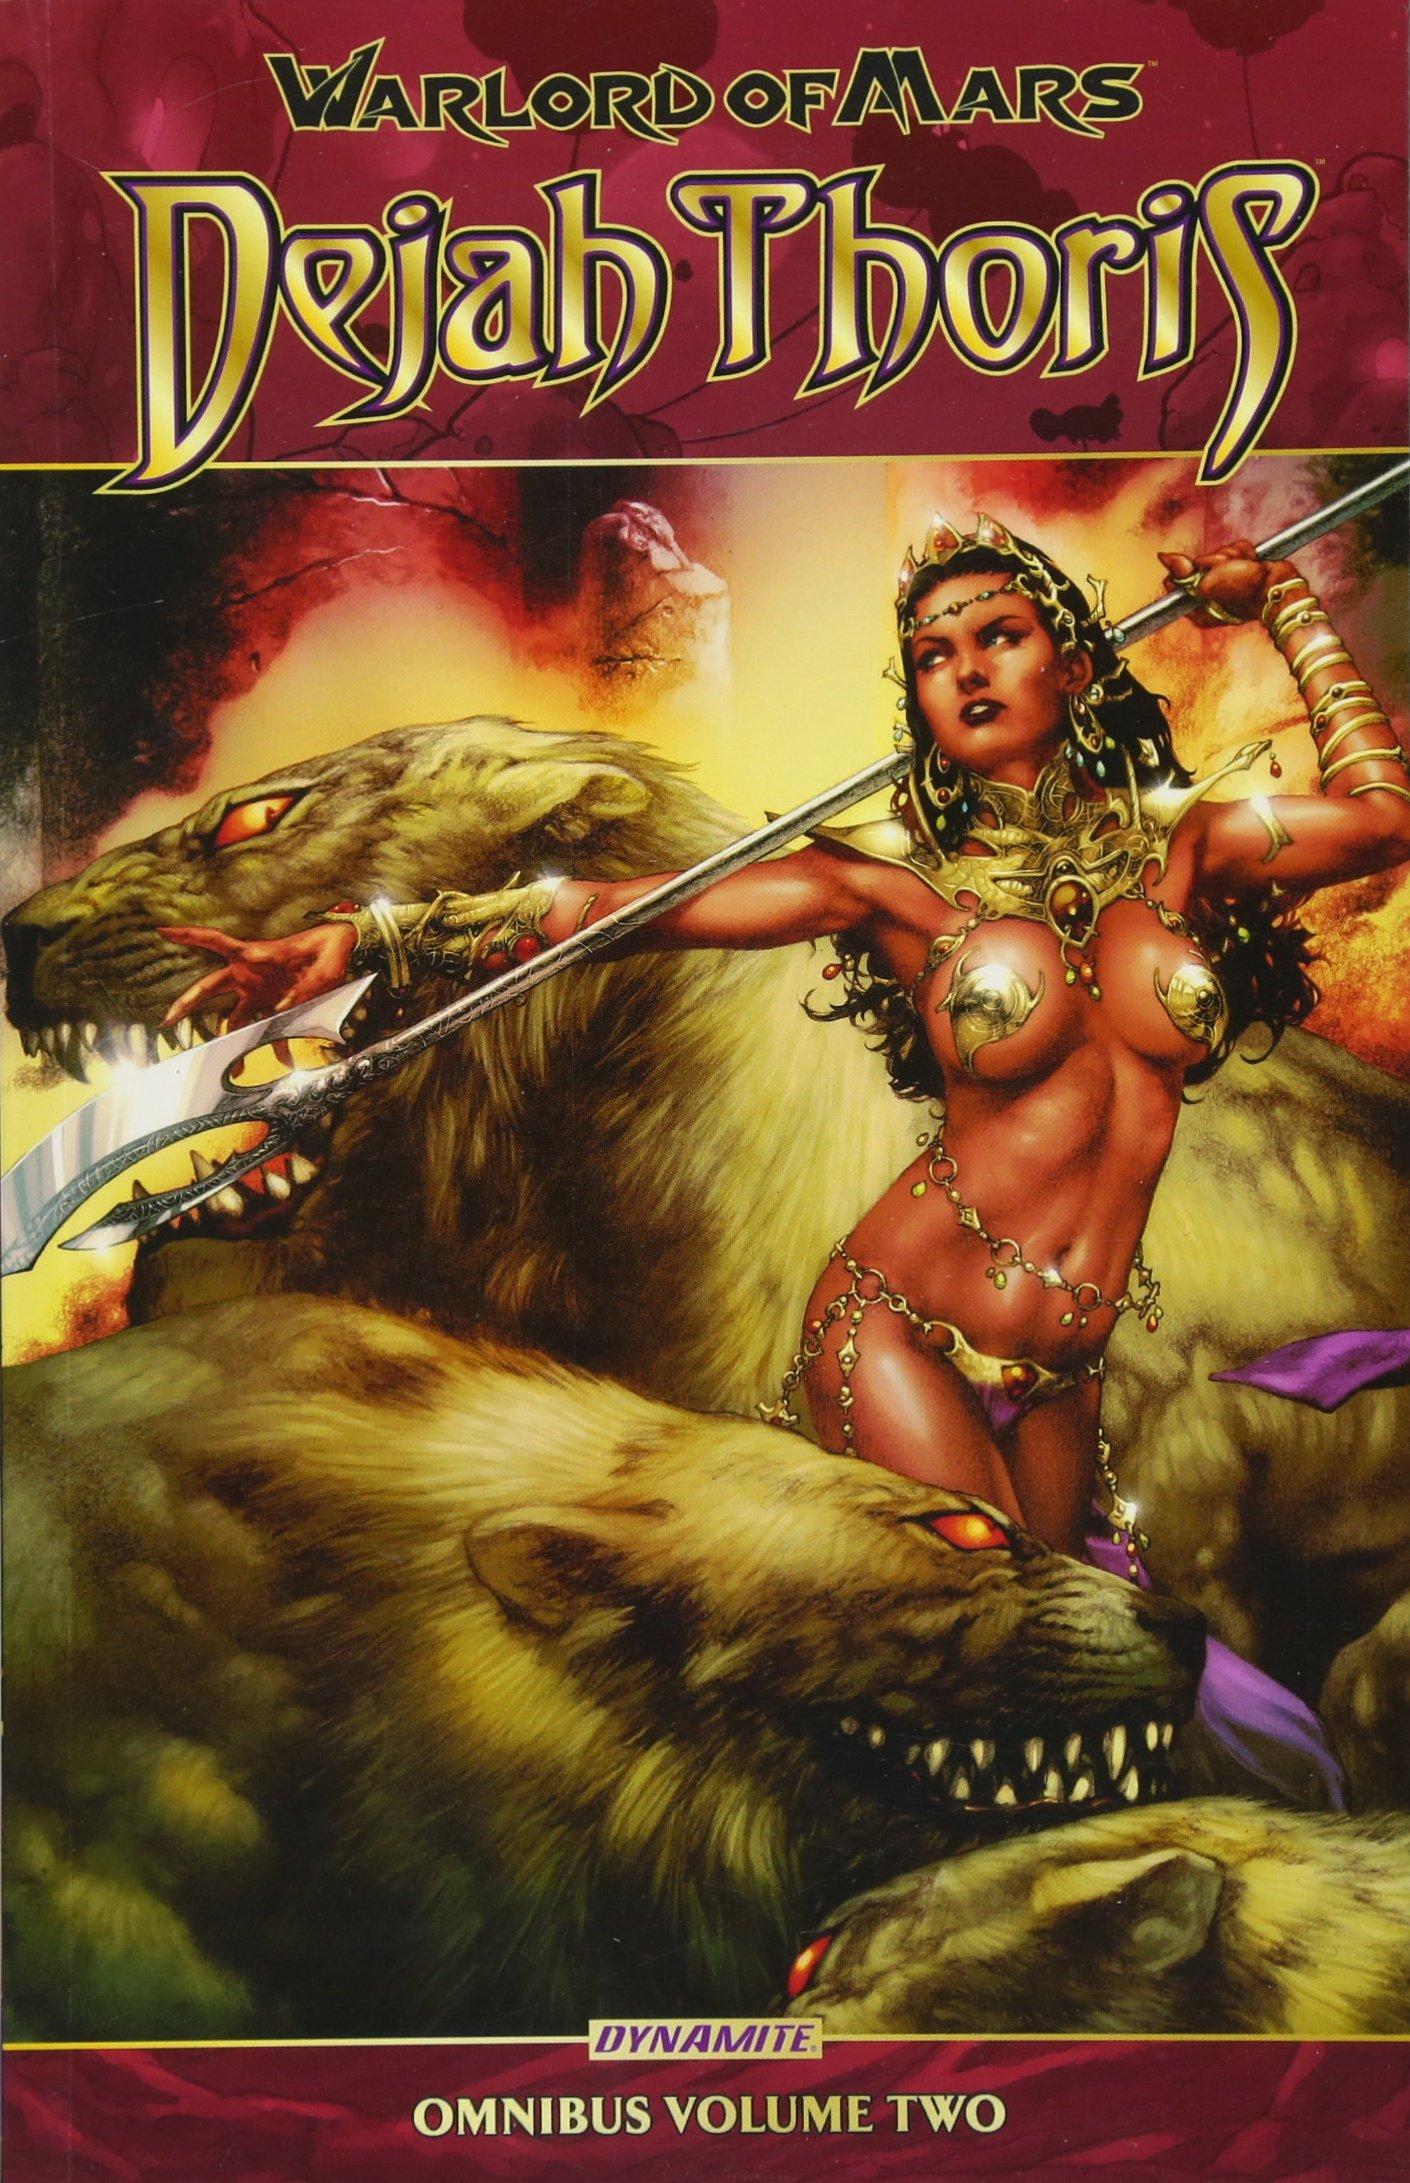 Download Warlord of Mars: Dejah Thoris Omnibus Vol. 2 ebook